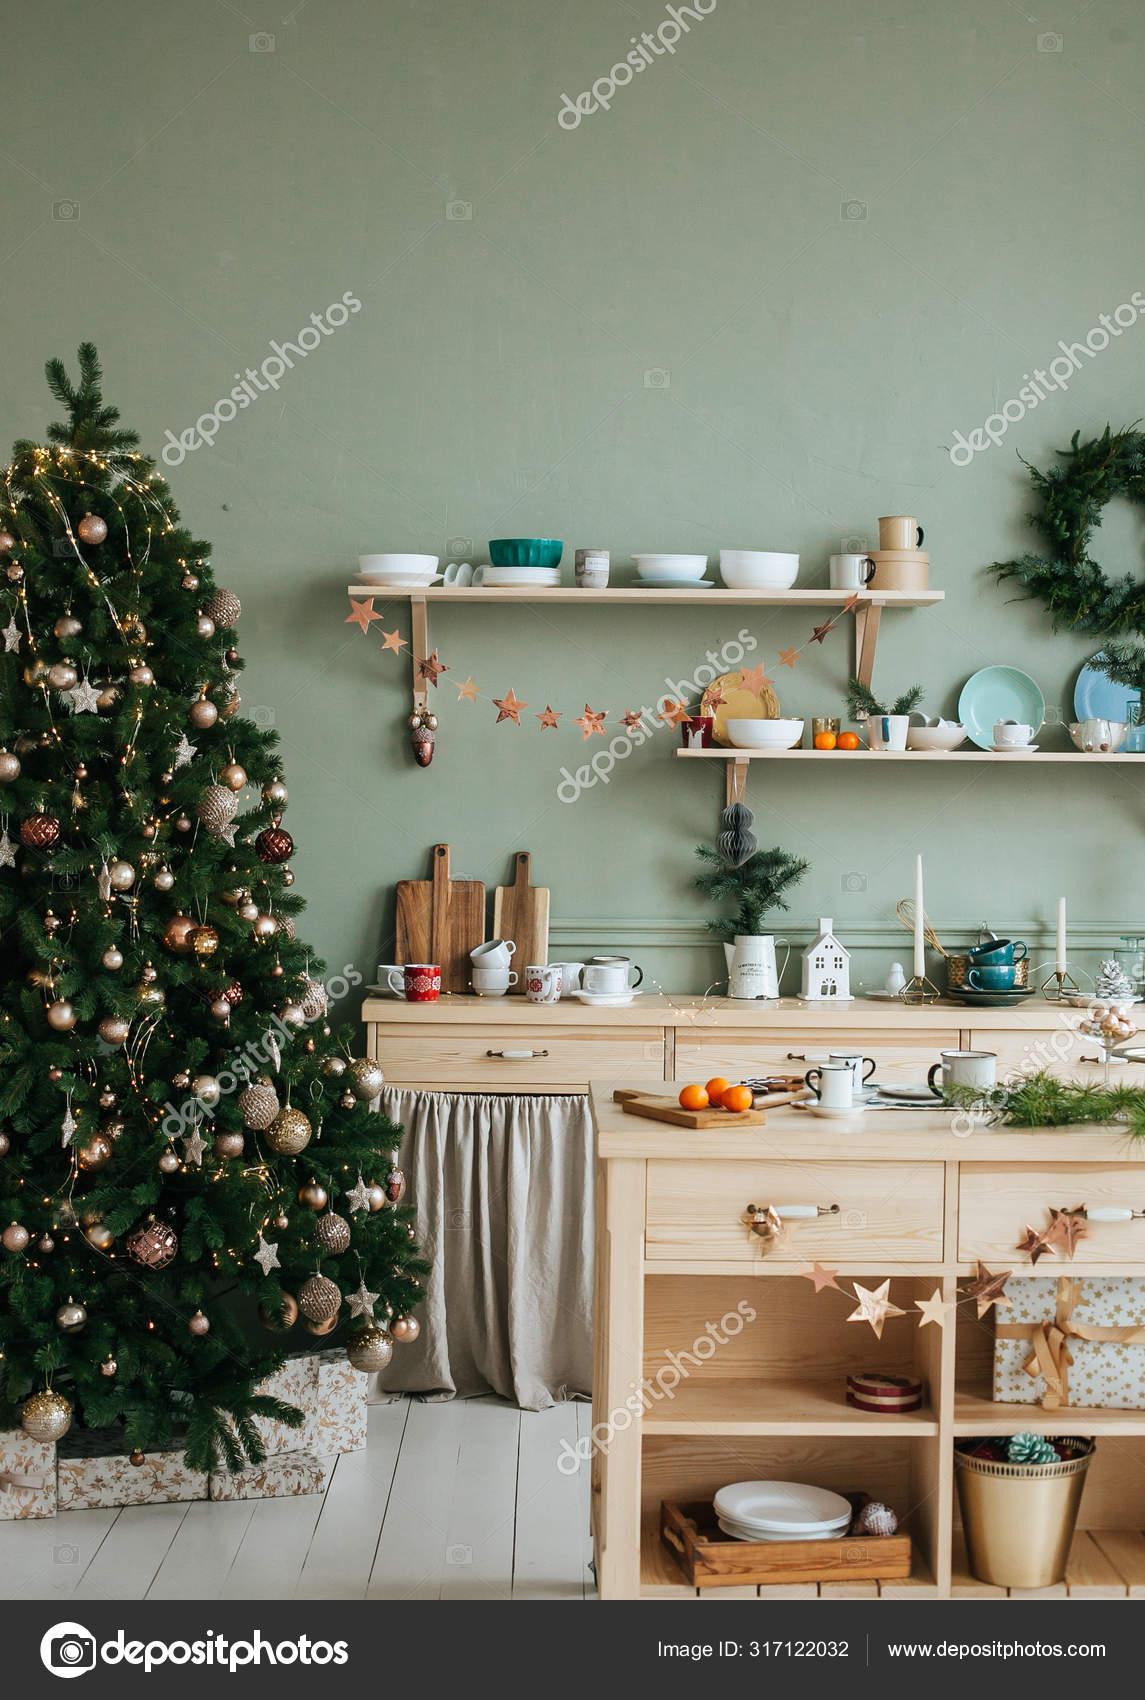 Decoration Apartment Christmas Holidays Stock Photo C Merry Vk 317122032